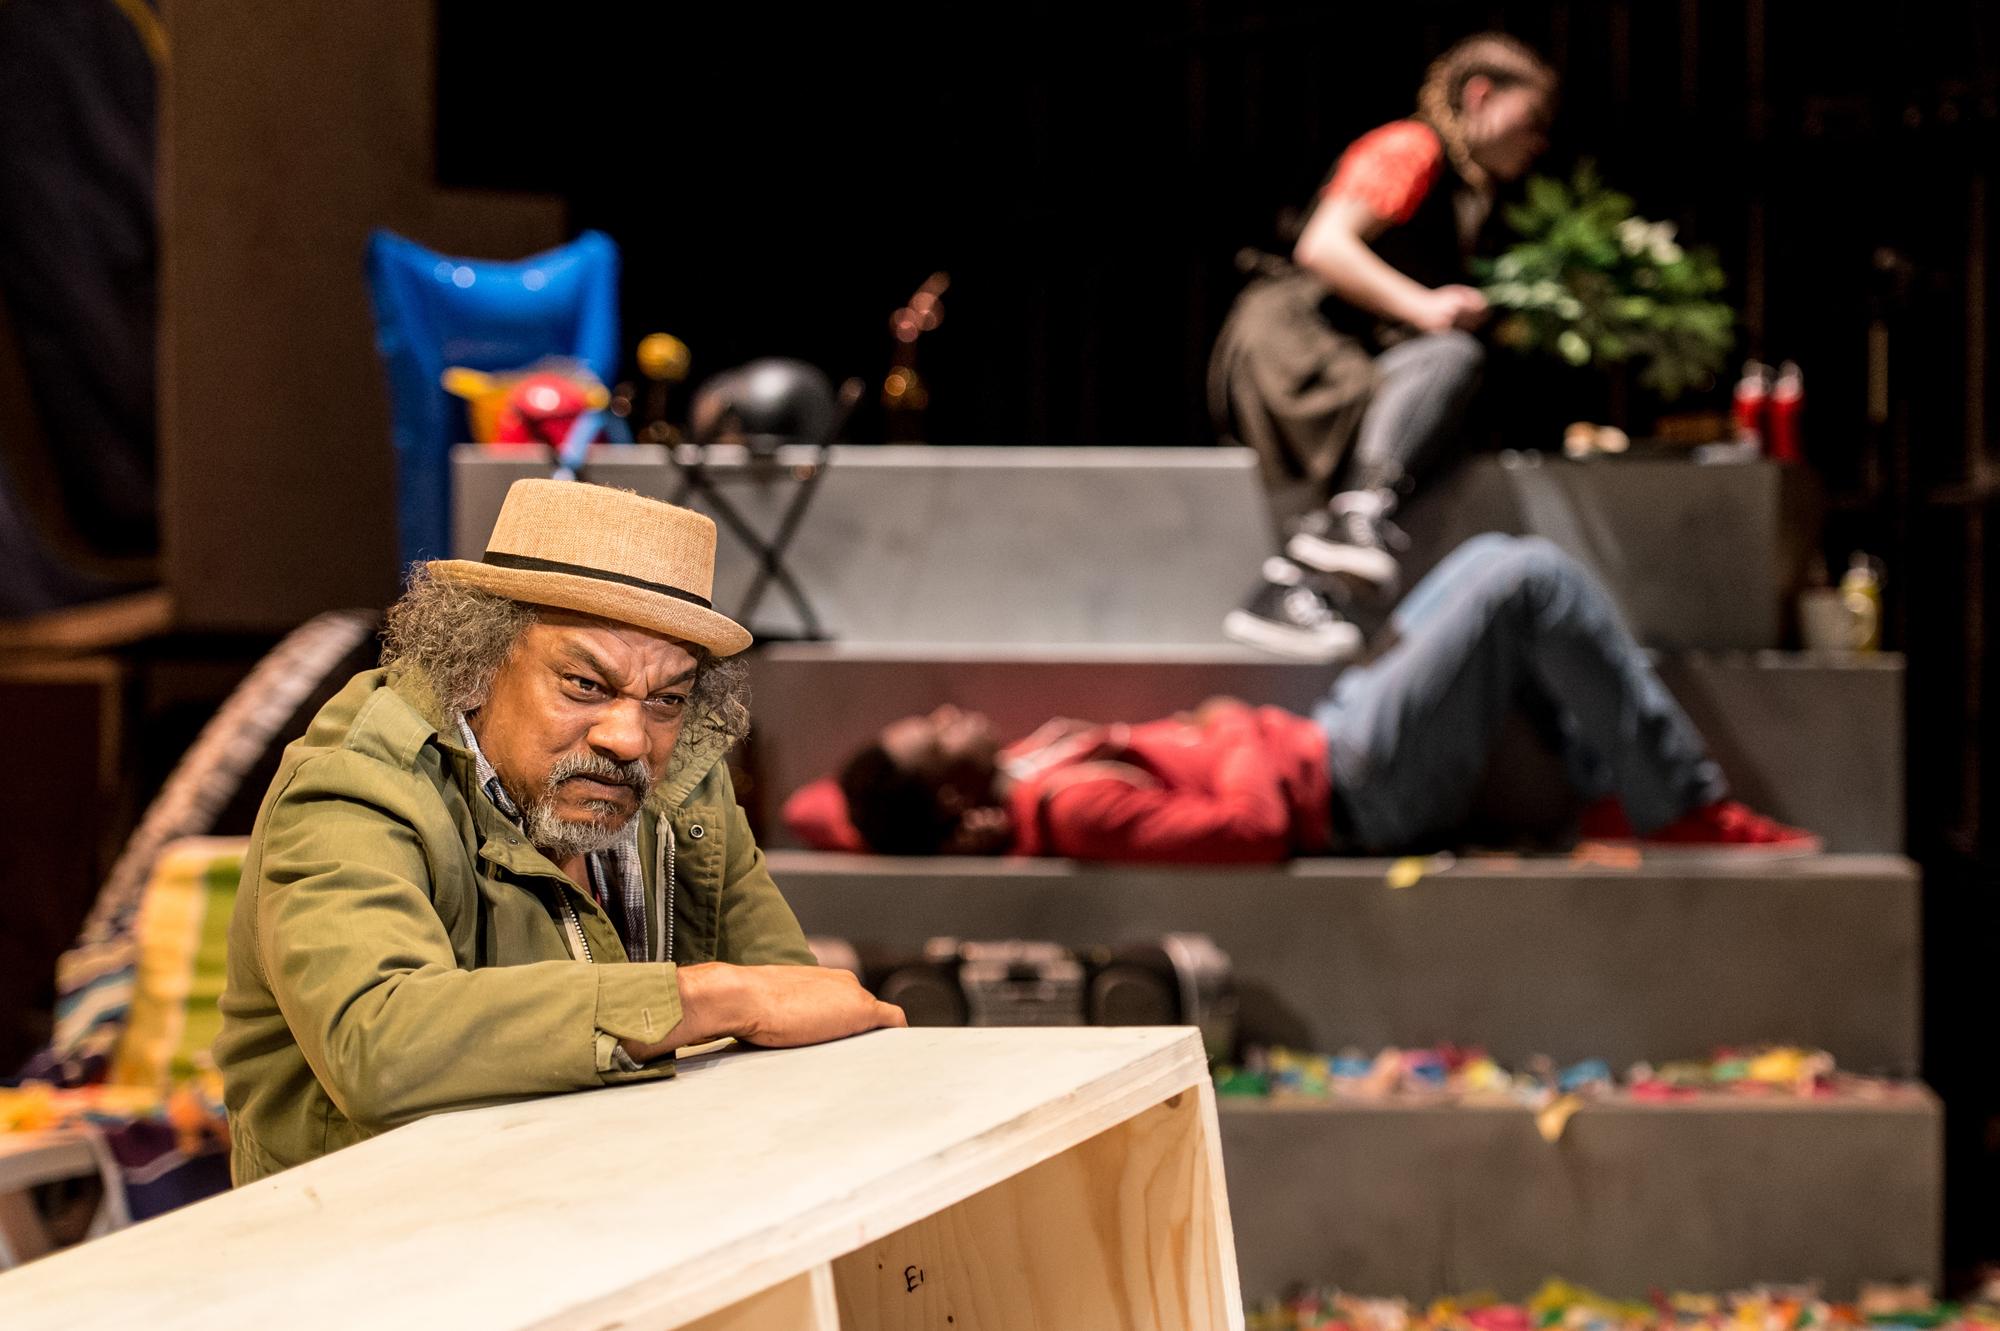 Jeffery-Kissoon-as-Odysseus,-4,-photo-credit-Manuel-Harlan.jpg